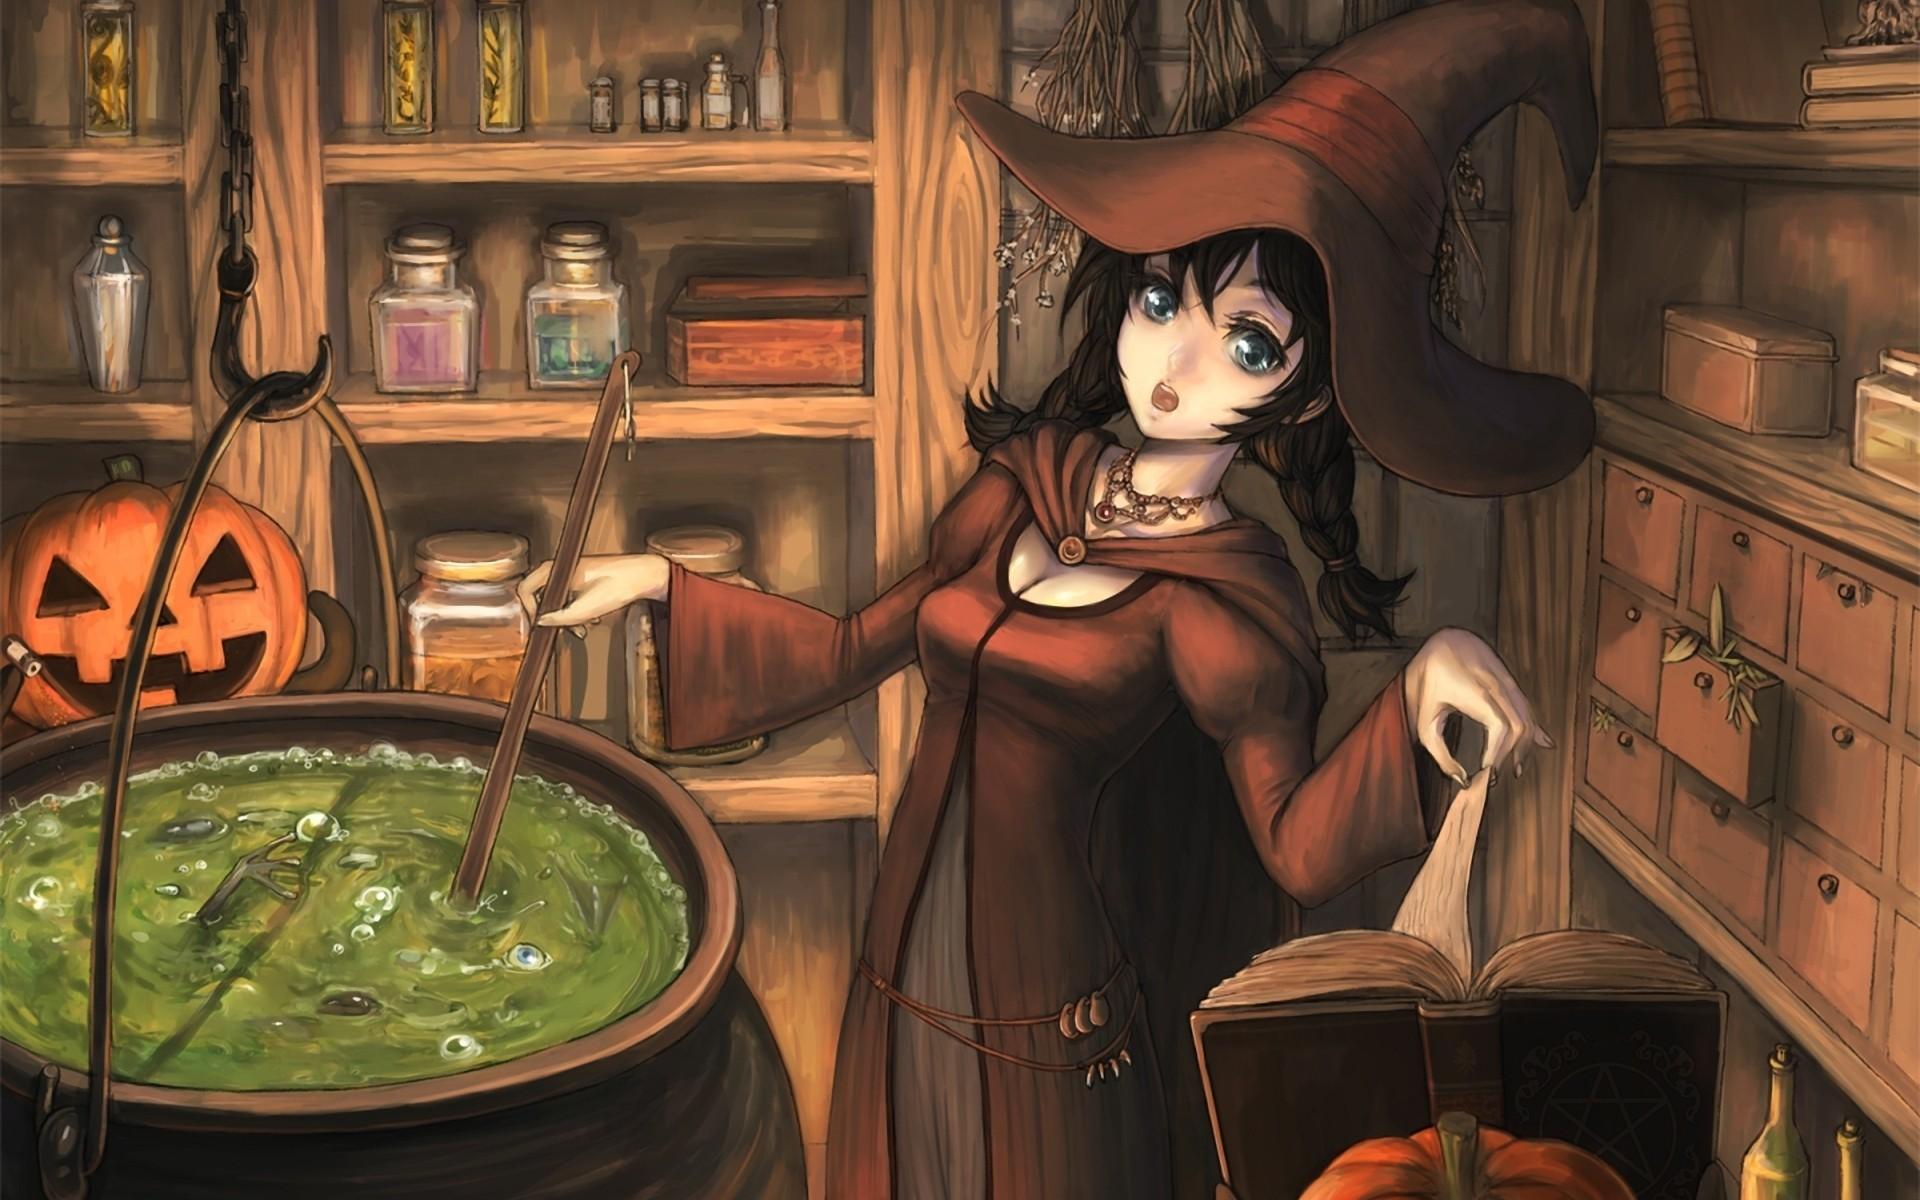 Halloween books hats anime girls pumpkins potion witches tiaras /  Wallpaper